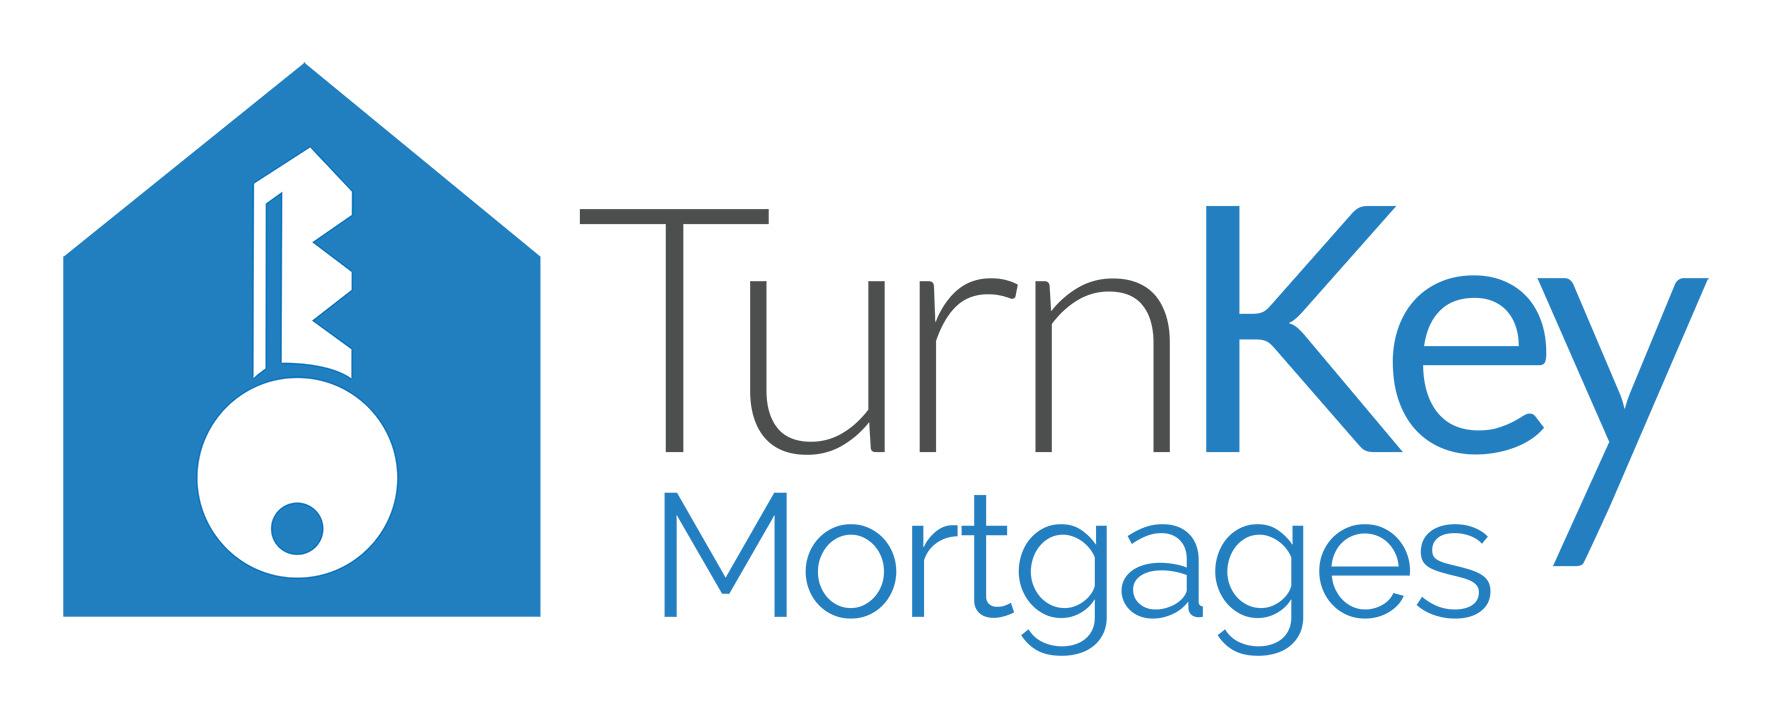 TurnKey Mortgages Limited - www.turnkeymortgages.co.uk